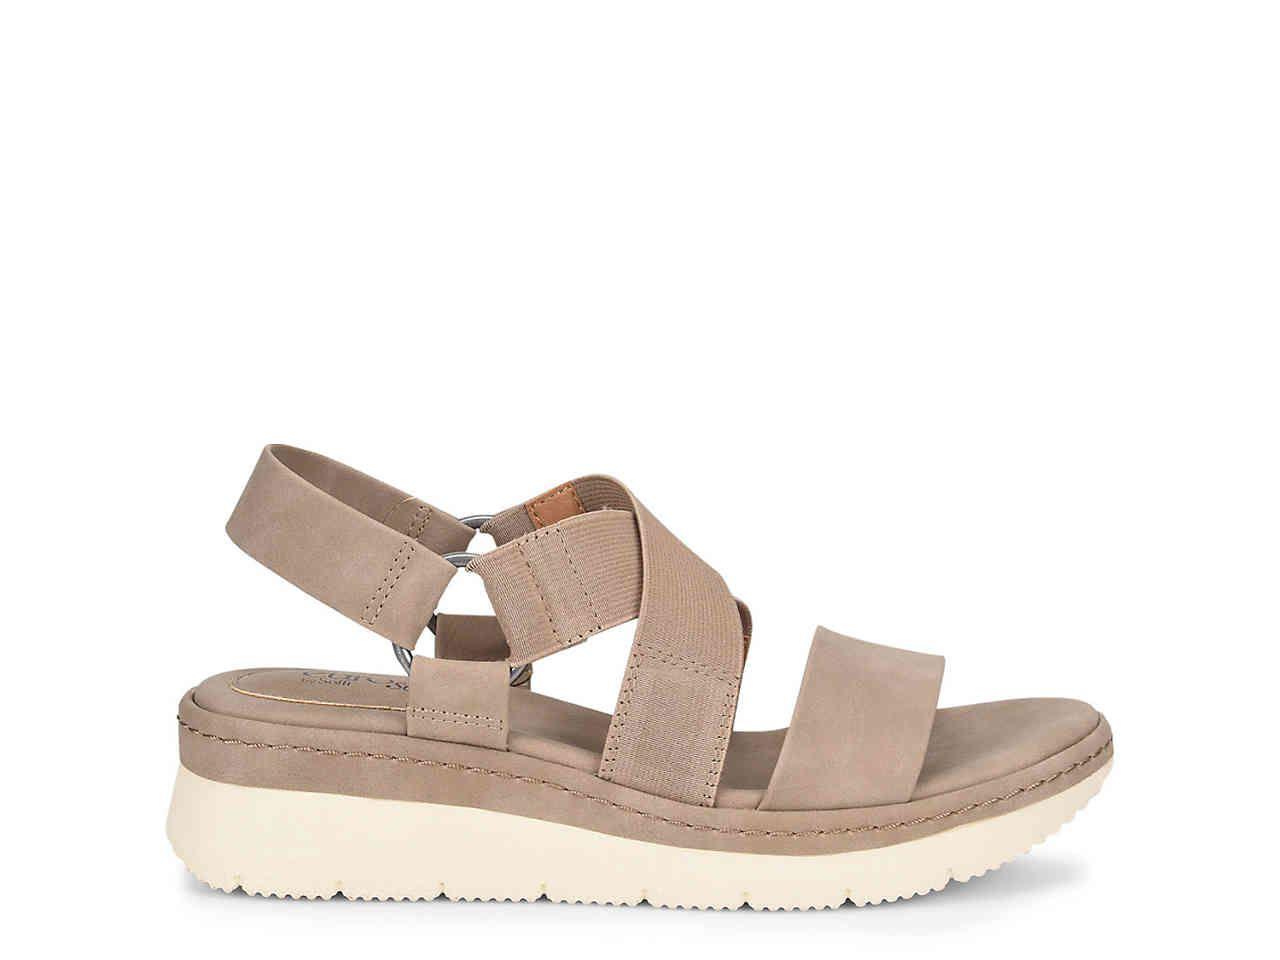 fa384601828c Eurosoft Cambry Wedge Sandal Women s Shoes